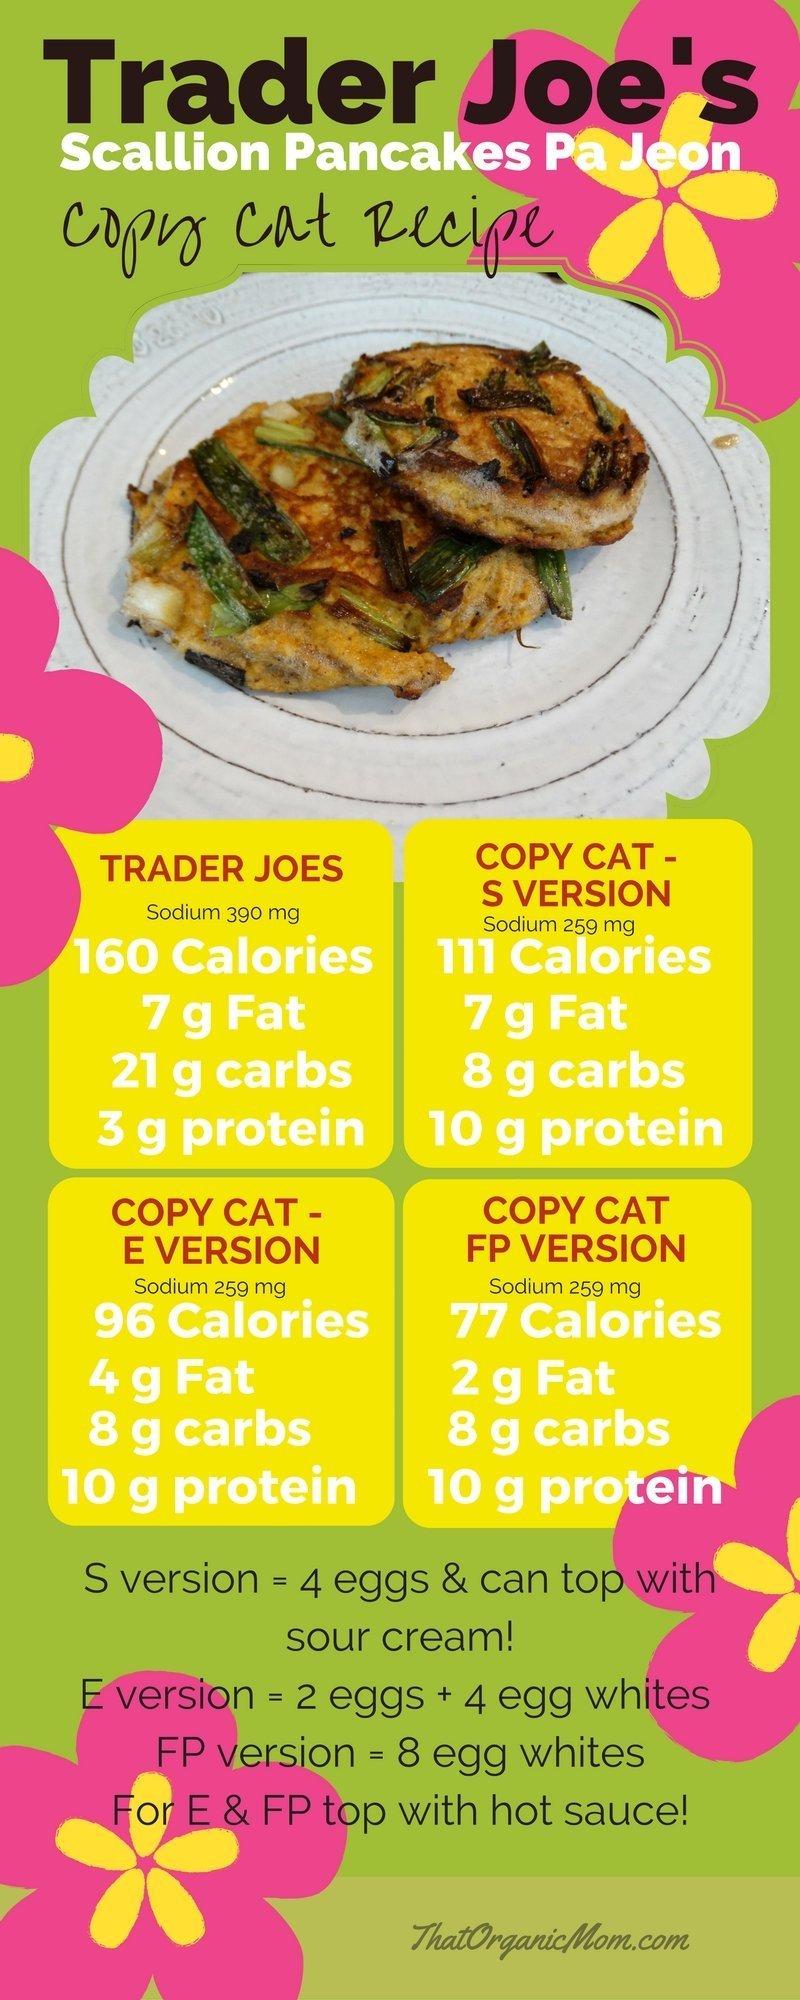 Trader Joe's Copy Cat Scallion Pancakes for Trim Healthy Mama's THREE ways, S, E or FP -- Enjoy!